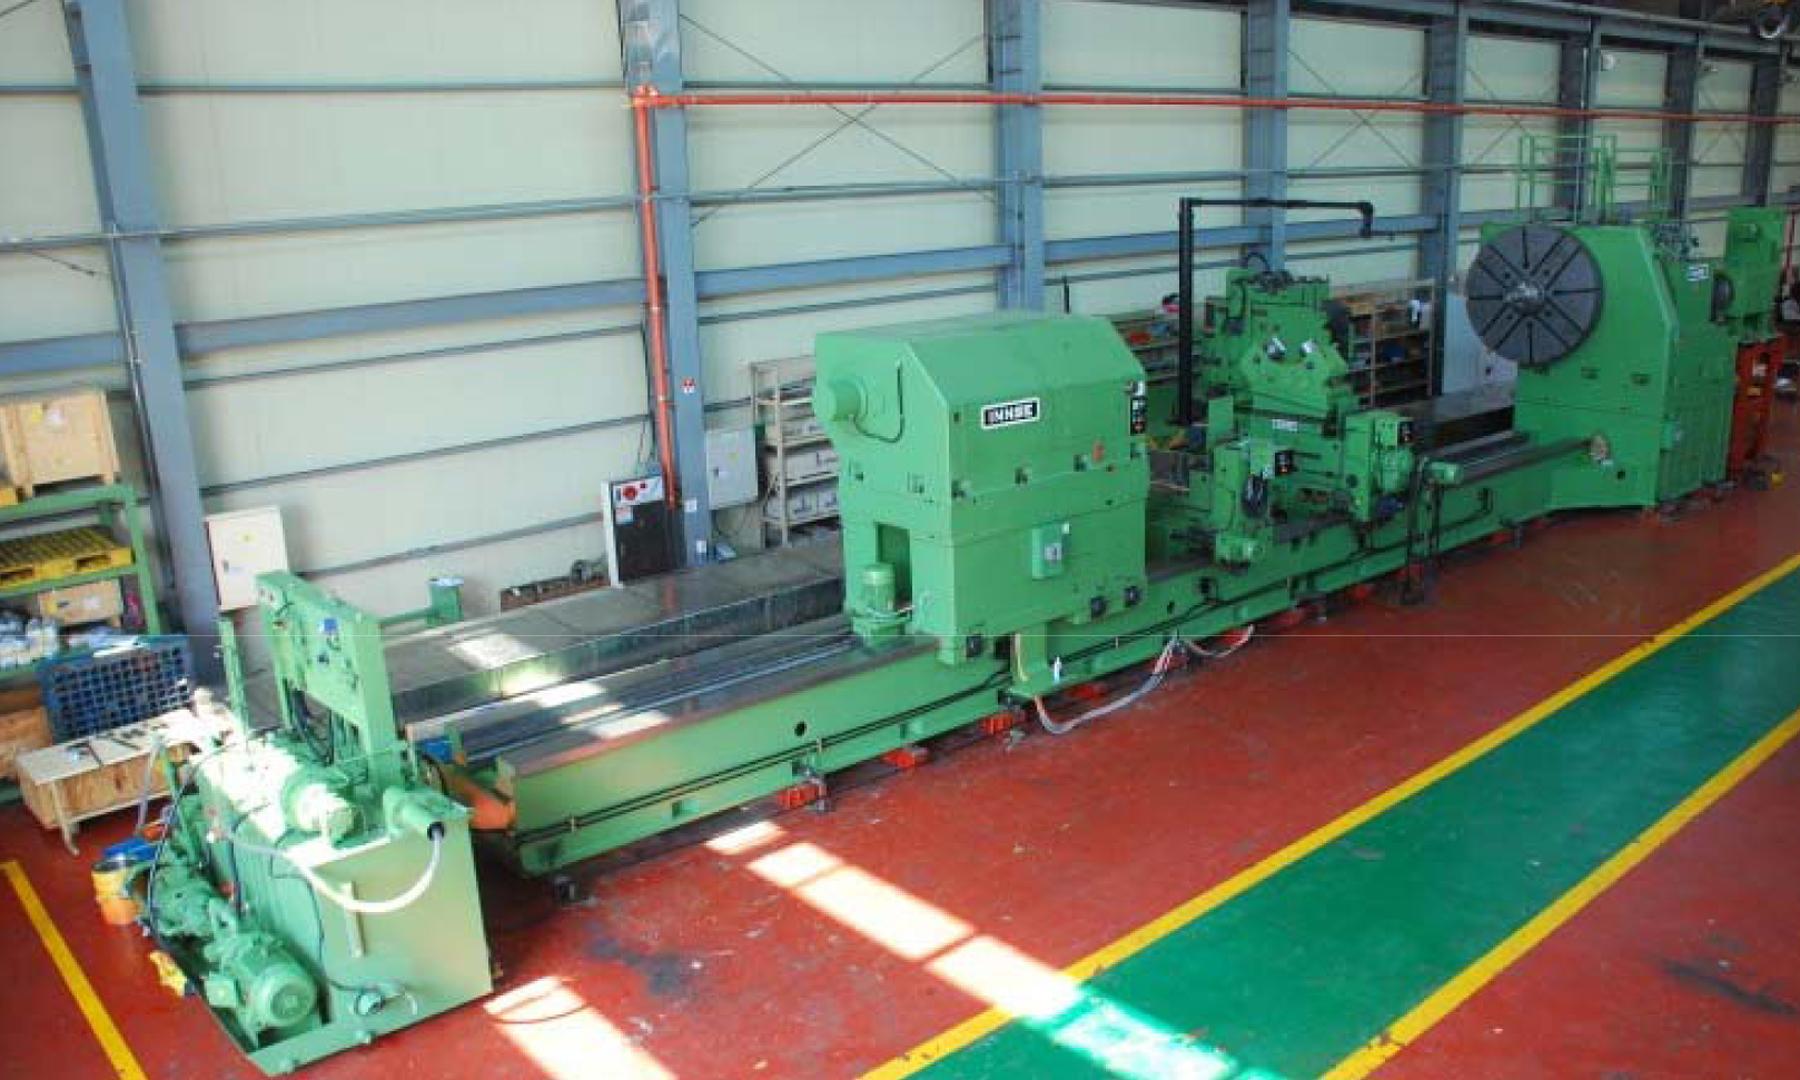 USED, INNSE CNC HORIZONTAL LATHE, MODEL D2,200 X 11-125